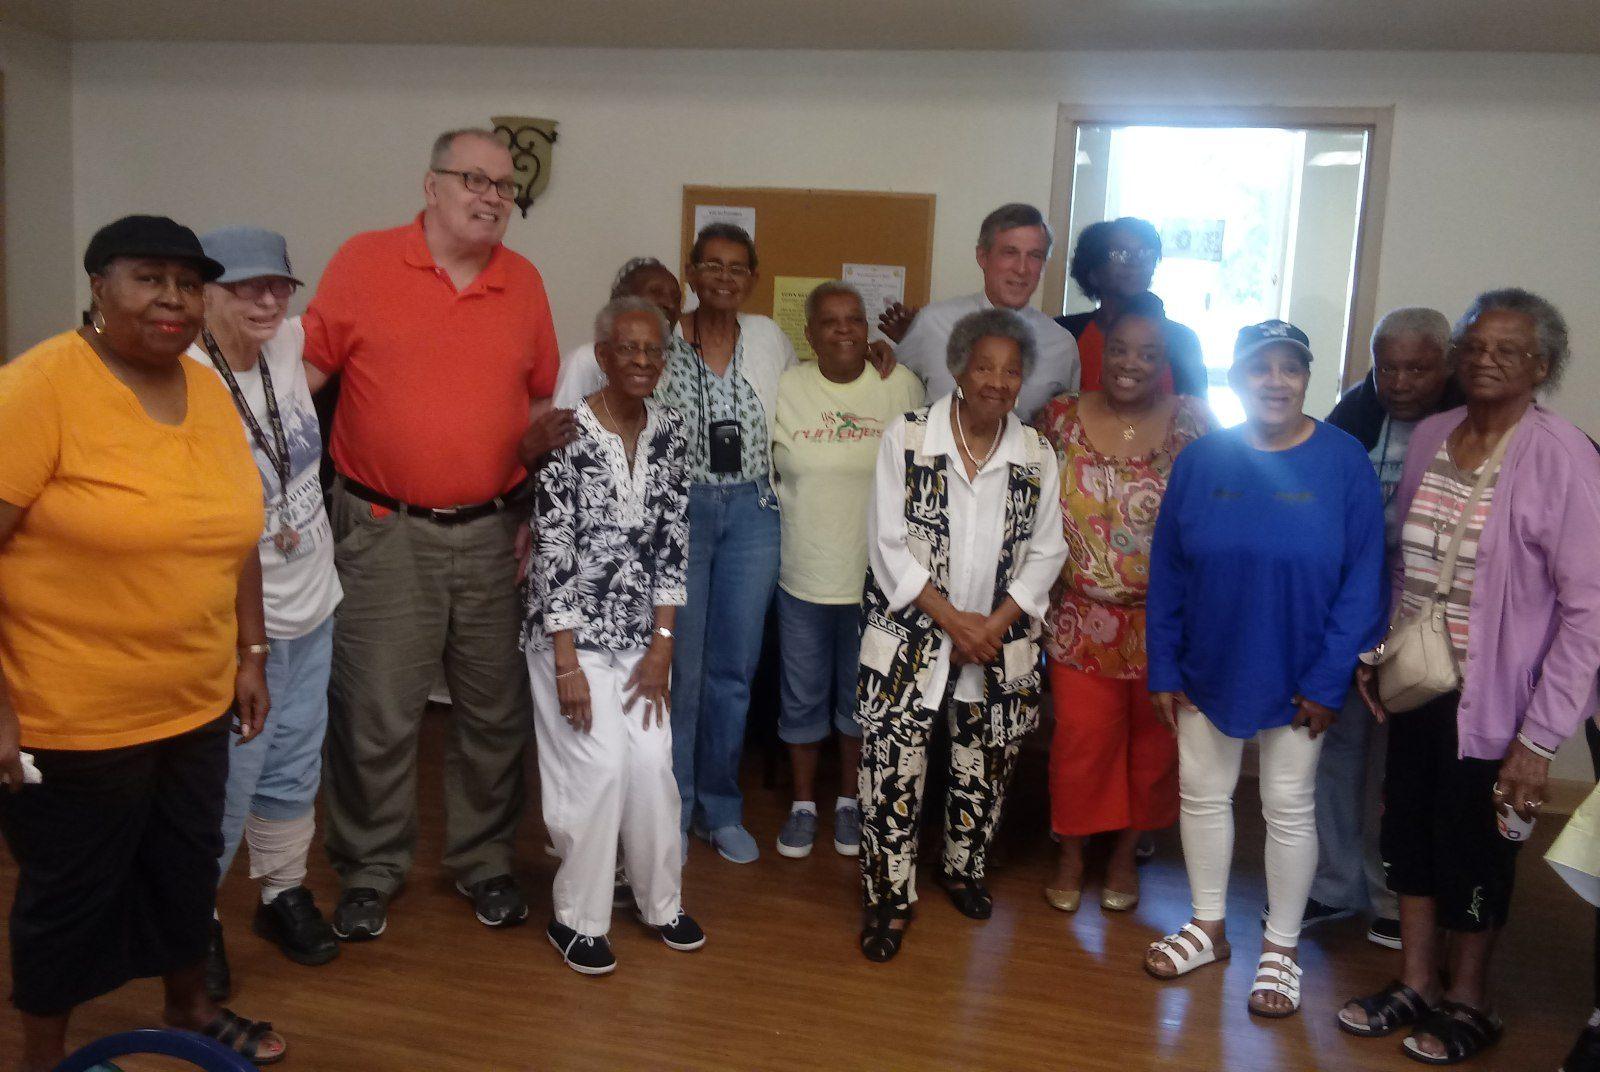 Wilmington Senior Center